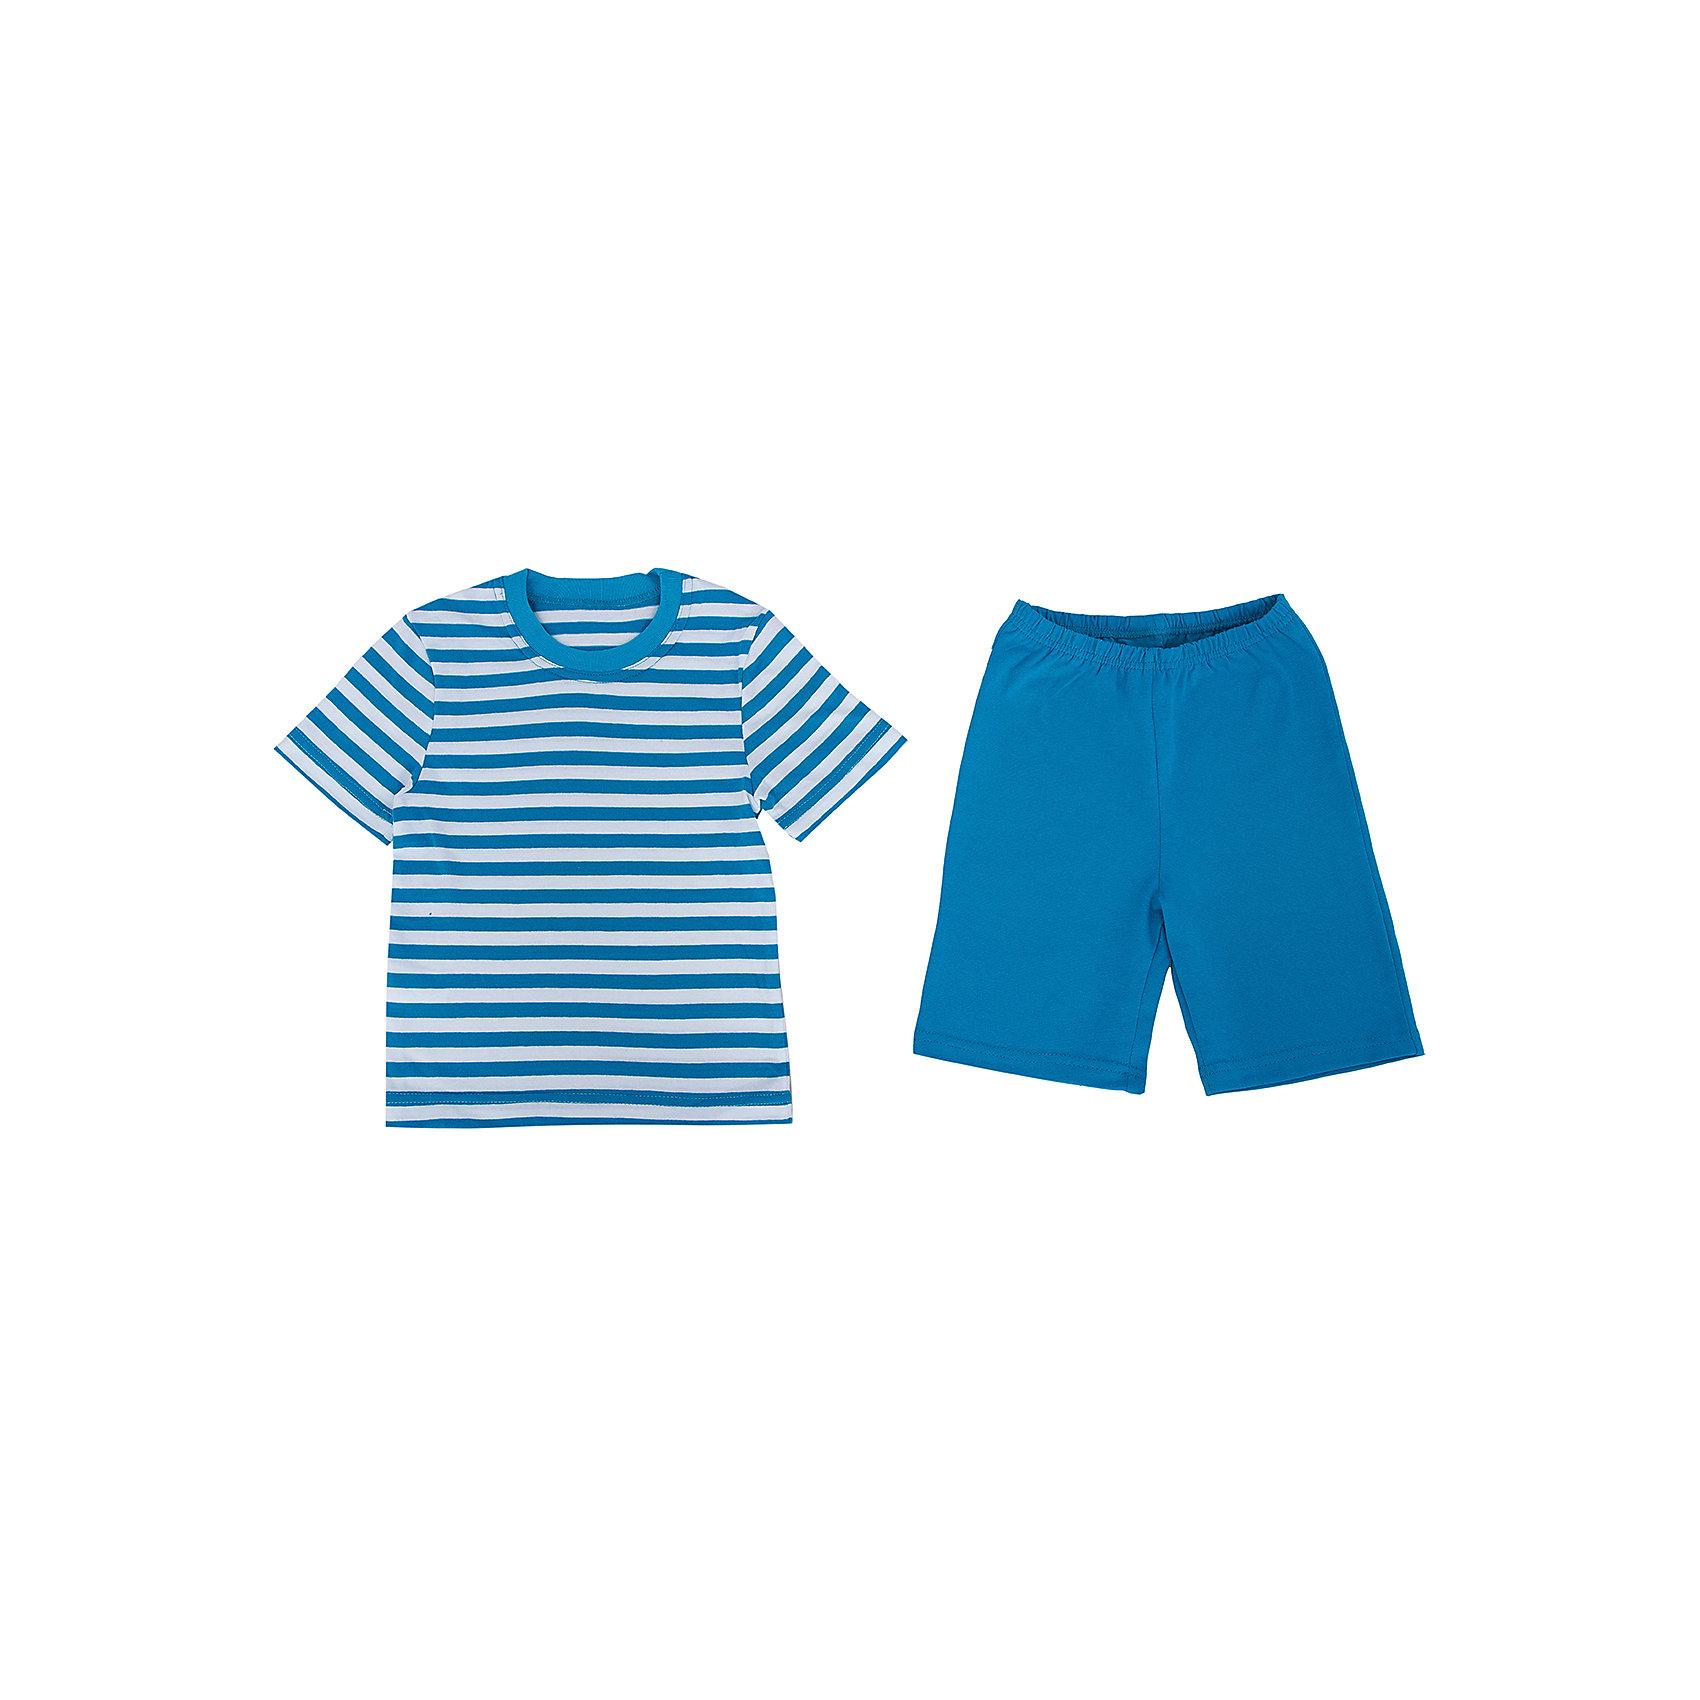 Пижама для мальчика АпрельПижама для мальчика от известного бренда Апрель. <br><br>Состав:<br>хлопок 100%, хлопок 95% + лайкра 5%<br><br>Ширина мм: 281<br>Глубина мм: 70<br>Высота мм: 188<br>Вес г: 295<br>Цвет: бирюзовый<br>Возраст от месяцев: 48<br>Возраст до месяцев: 60<br>Пол: Мужской<br>Возраст: Детский<br>Размер: 110,104,116,86,92,98<br>SKU: 4768098